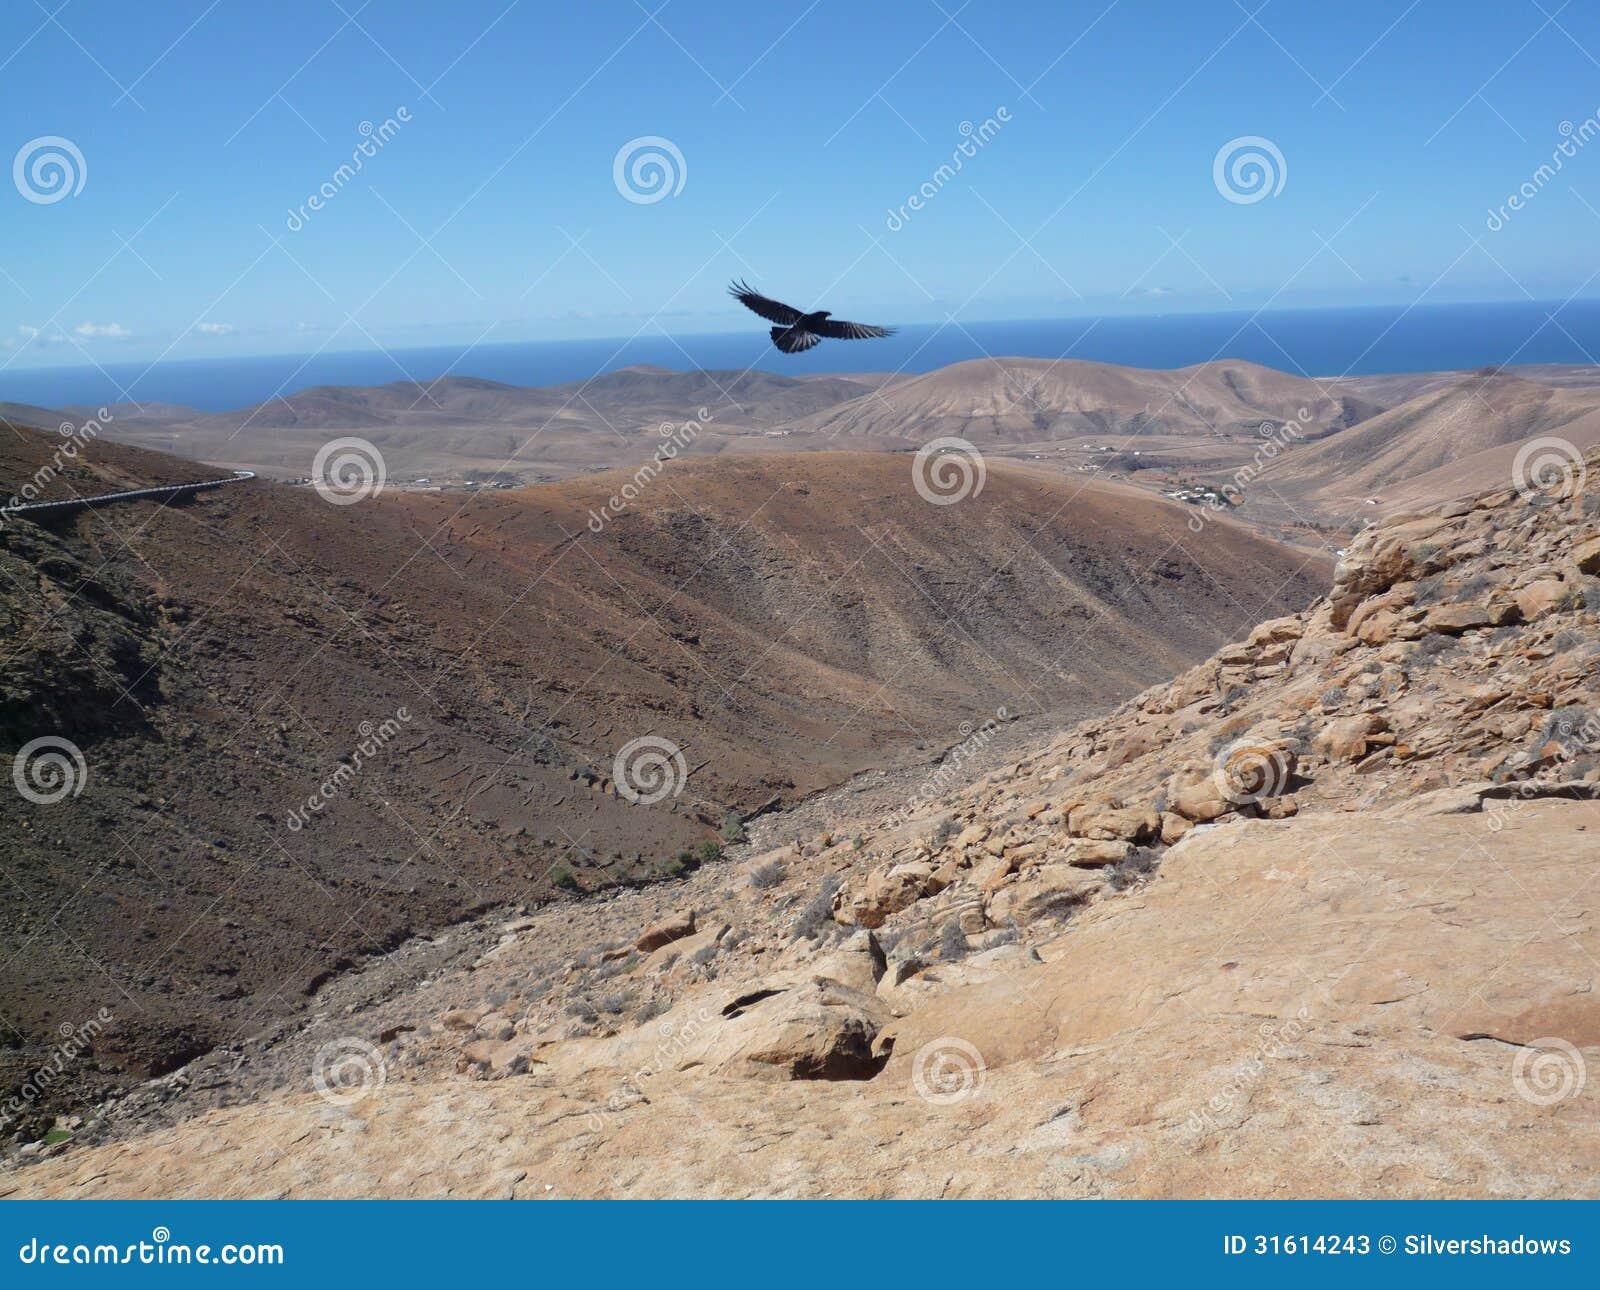 Open Mountain window view with bird in Fuerteventura Canary/islands